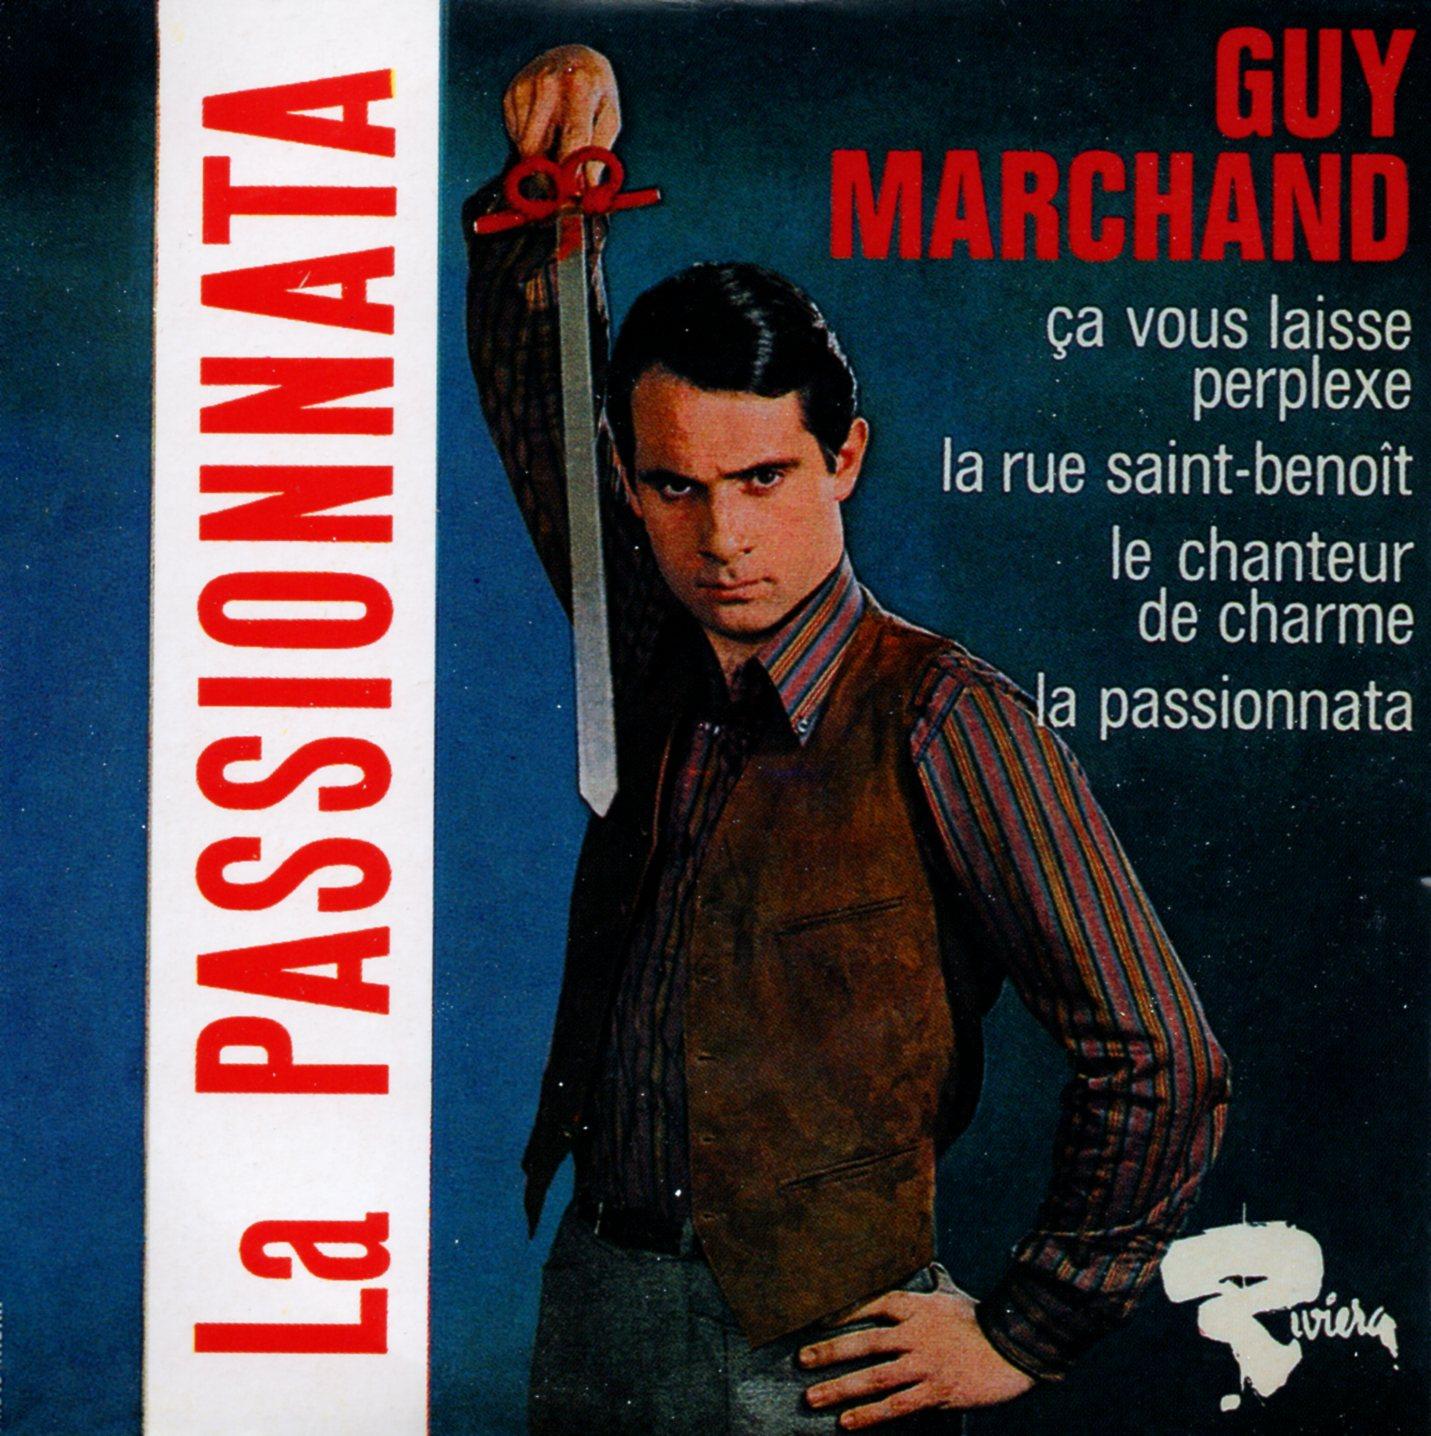 GUY MARCHAND - La passionata 4-TRACK CARD SLEEVE - CD single